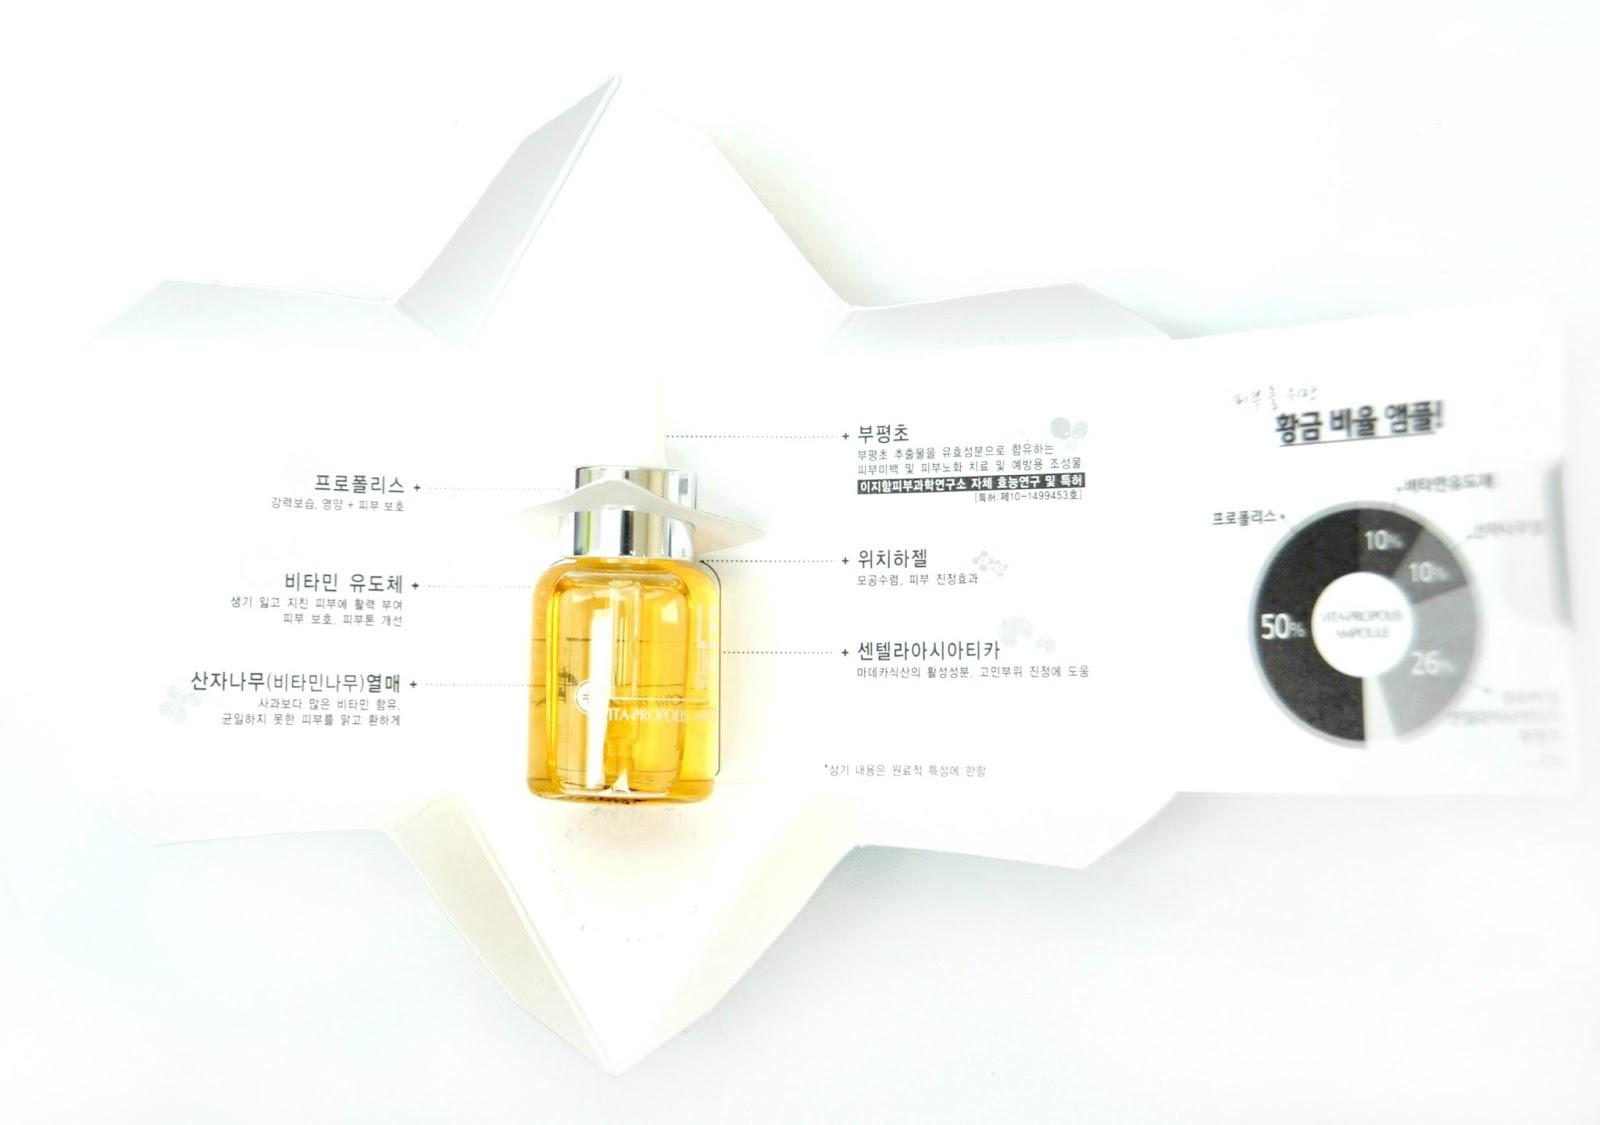 Lee Ji ham Vita Propolis Ampoule Review Korean Beauty